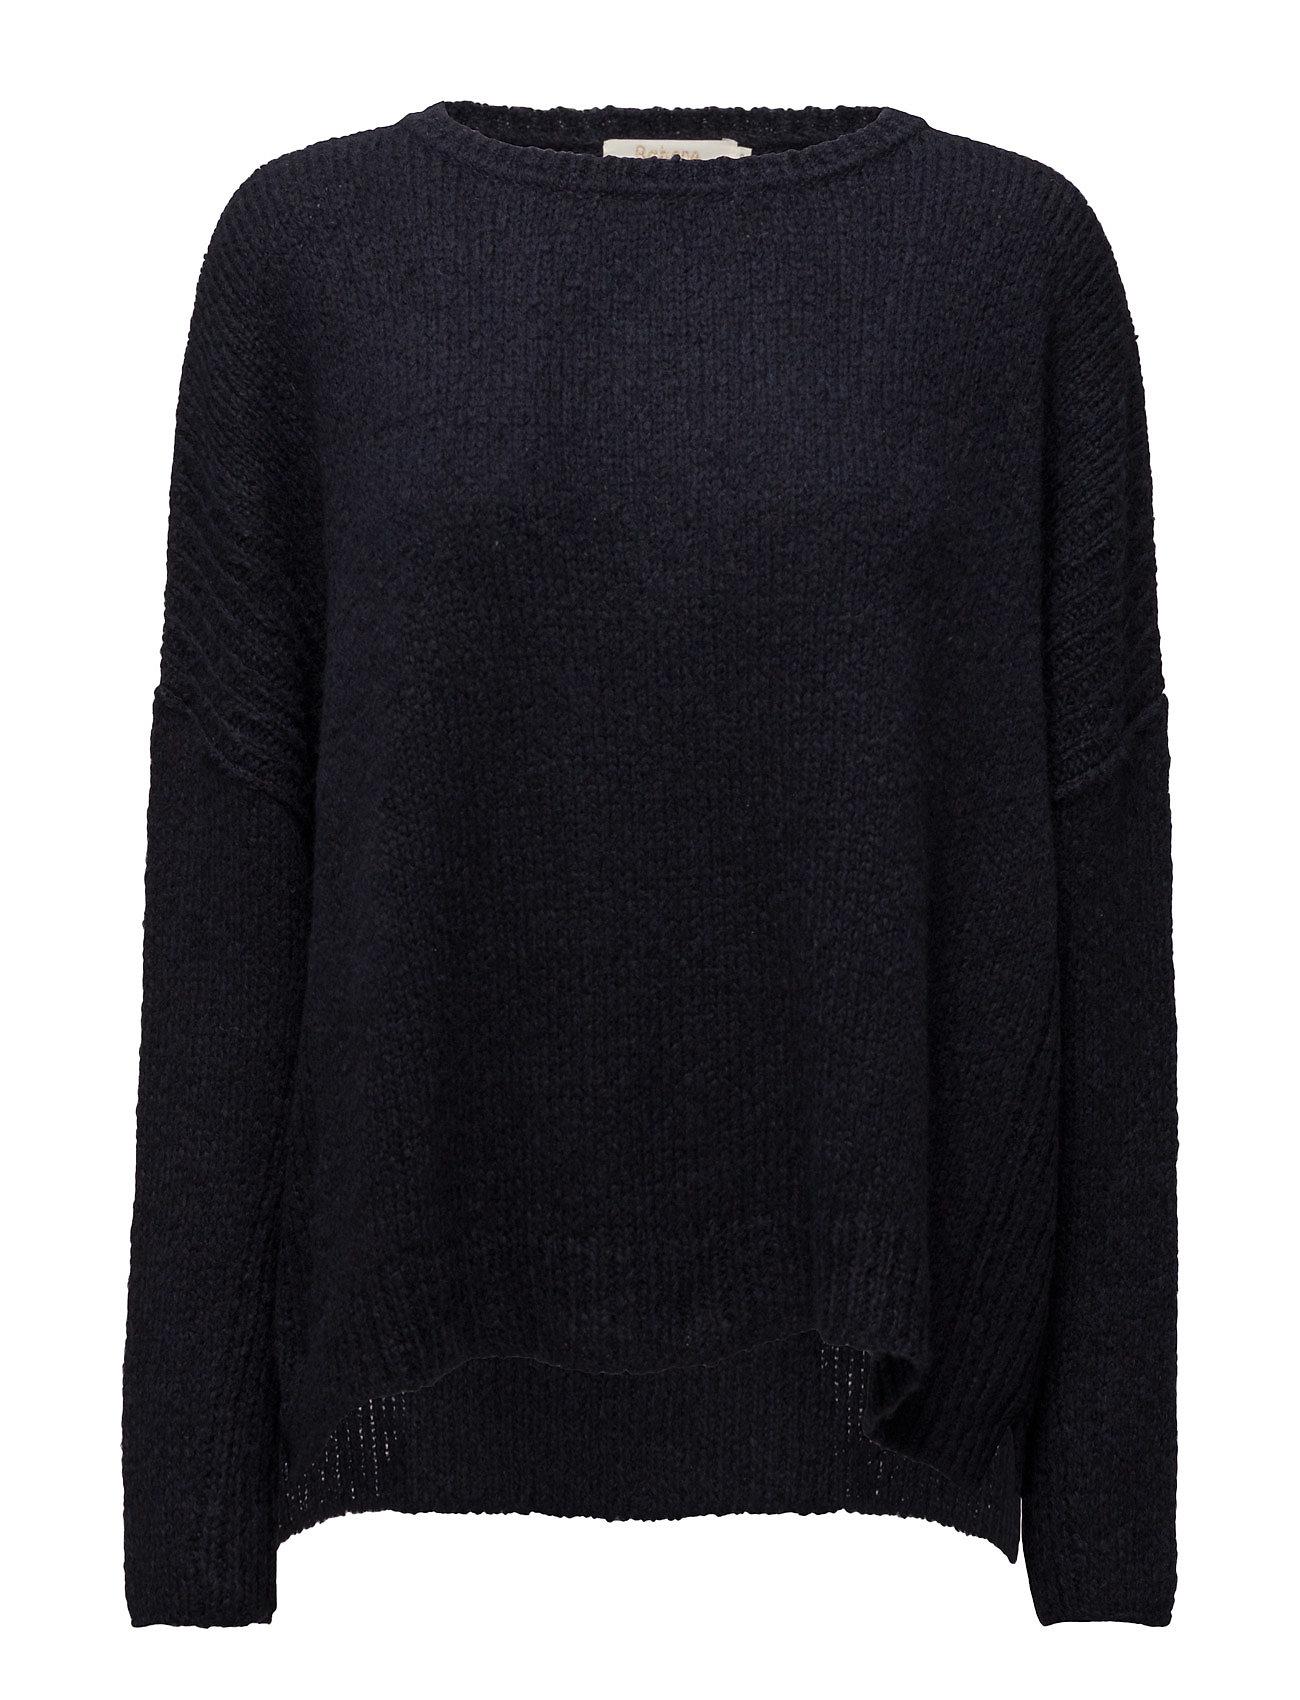 rabens saloner – Linked boxy sweater fra boozt.com dk